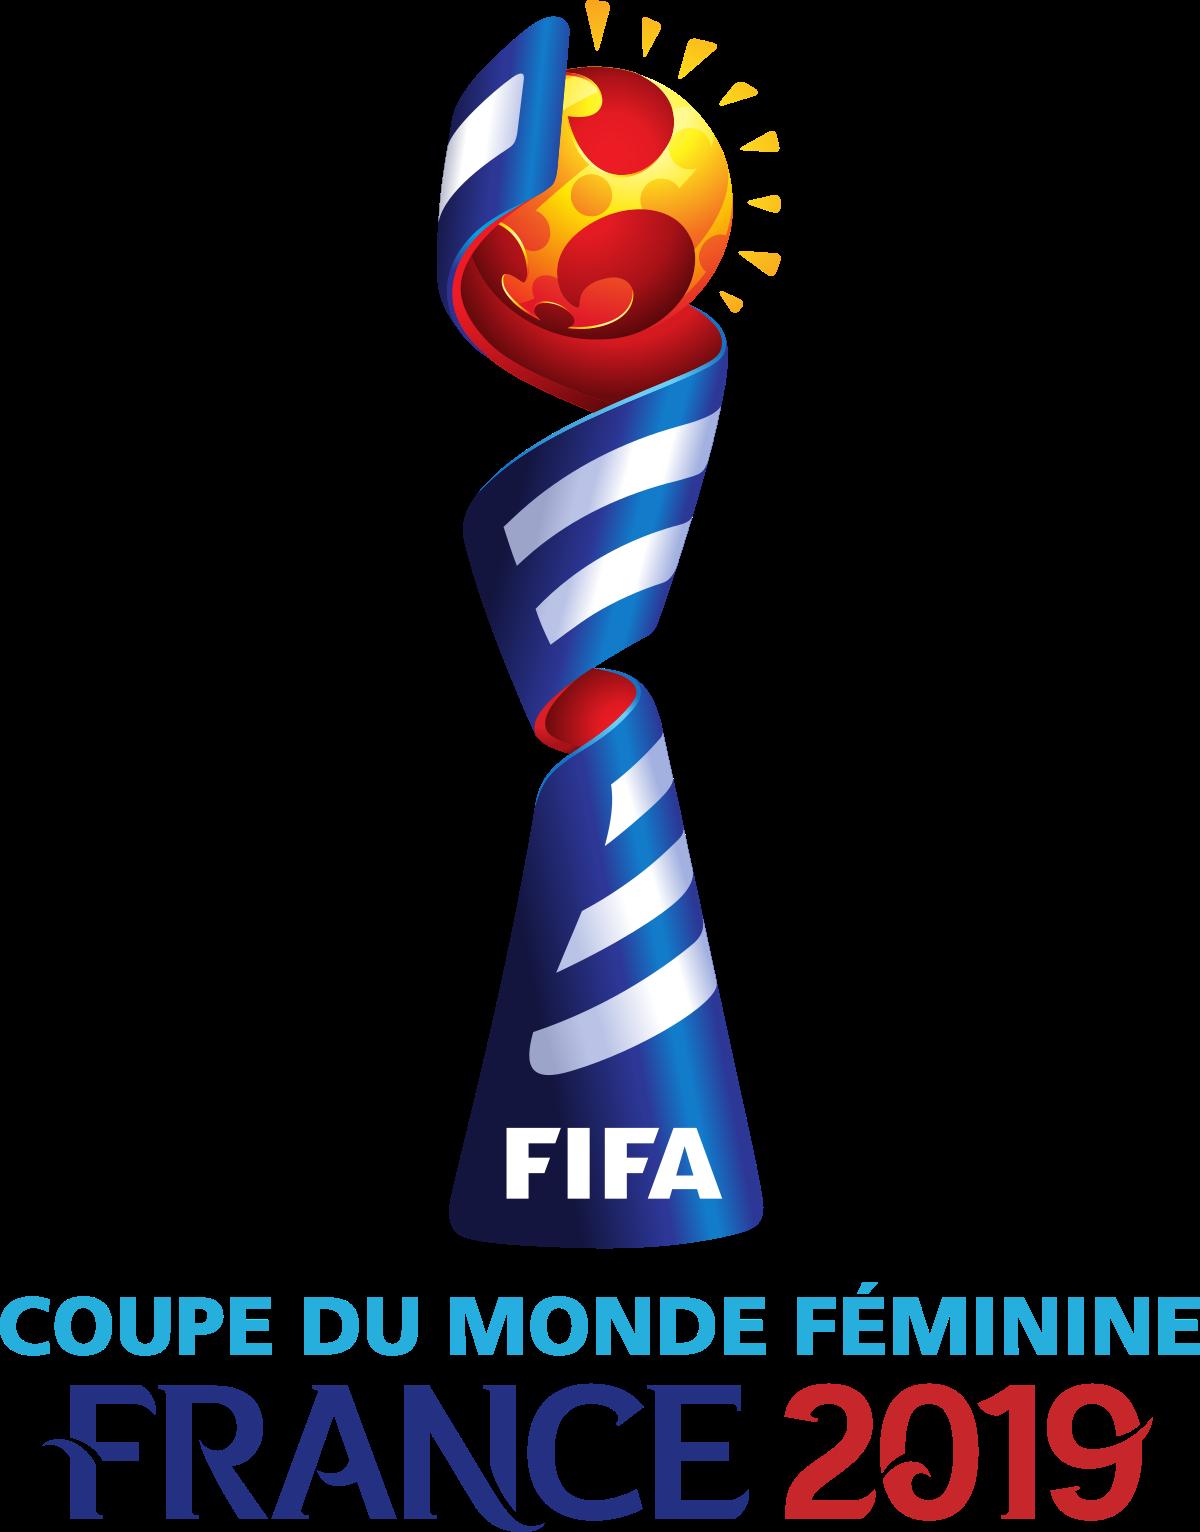 Coupe du monde féminine de football 2019